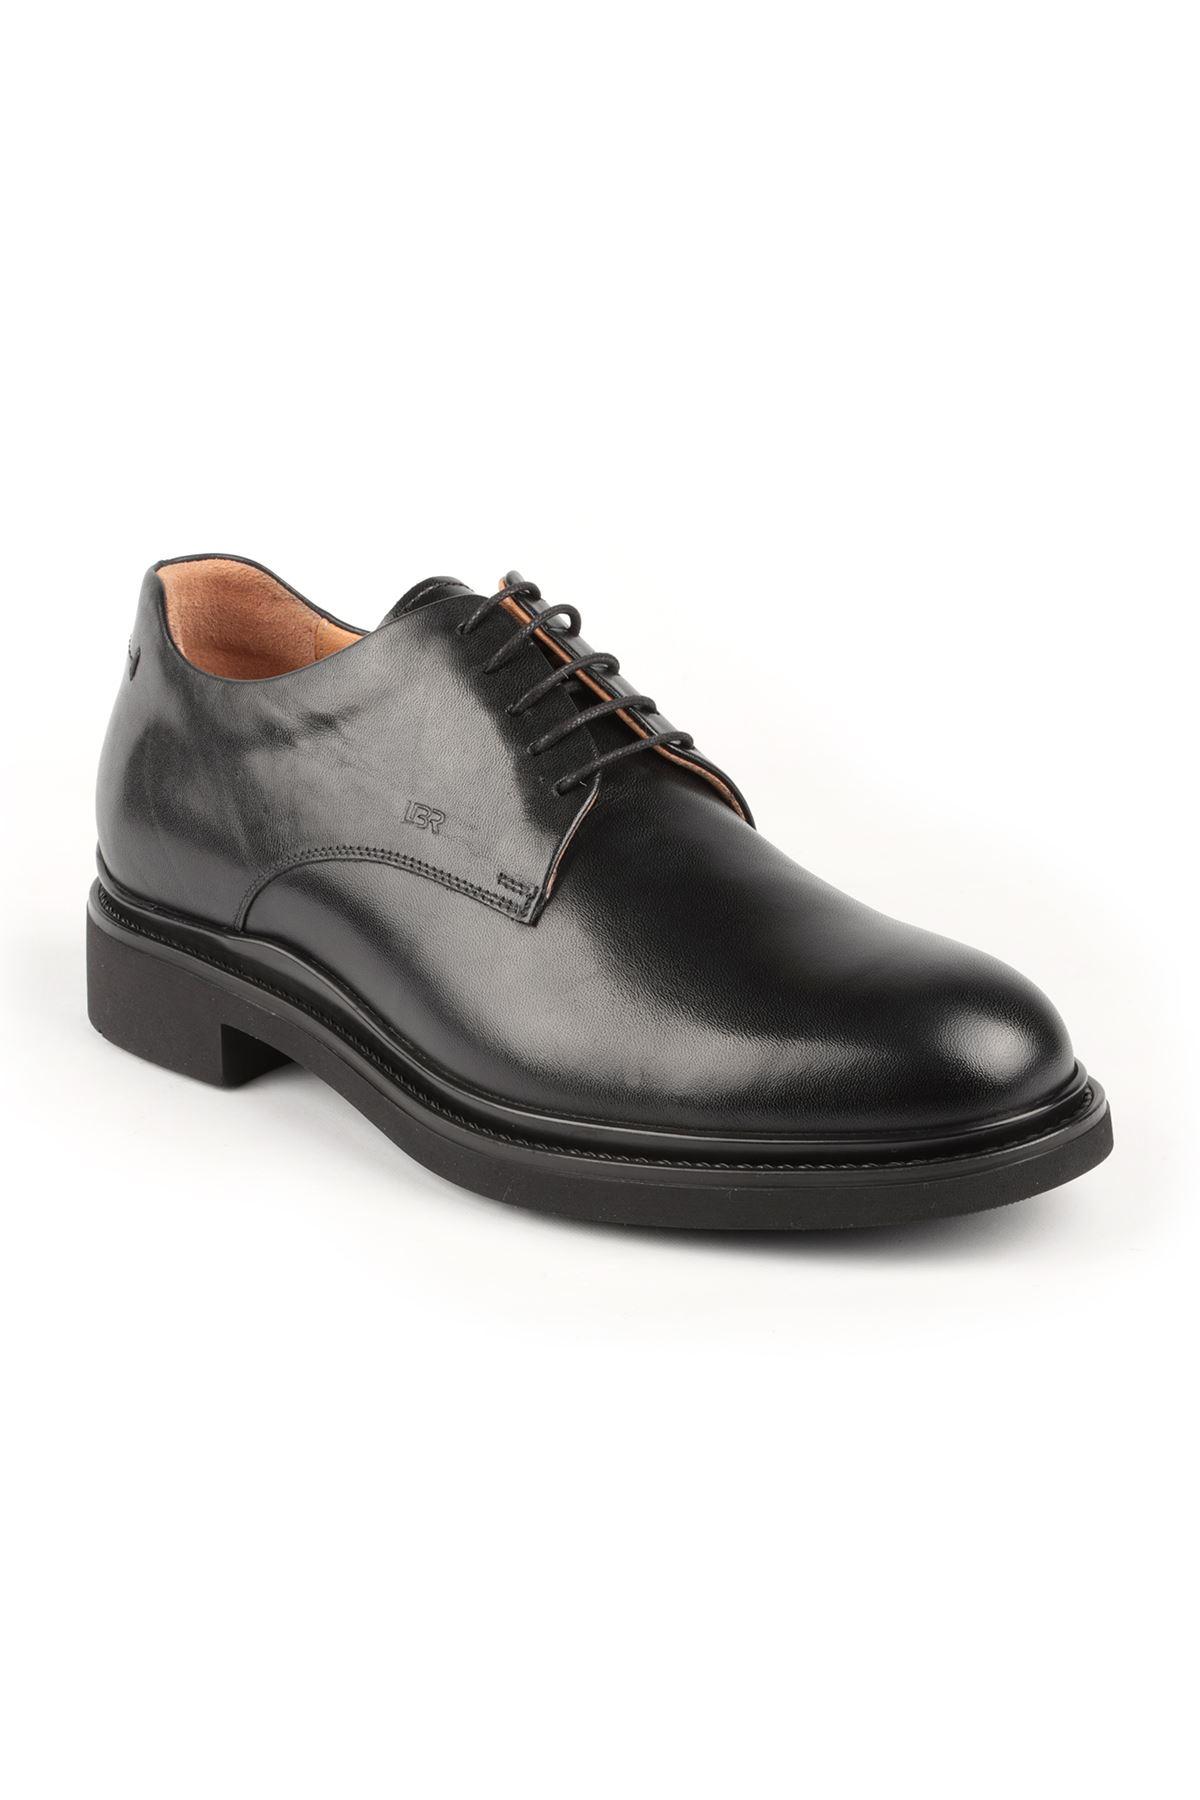 Libero L3455 Siyah Klasik Ayakkabı